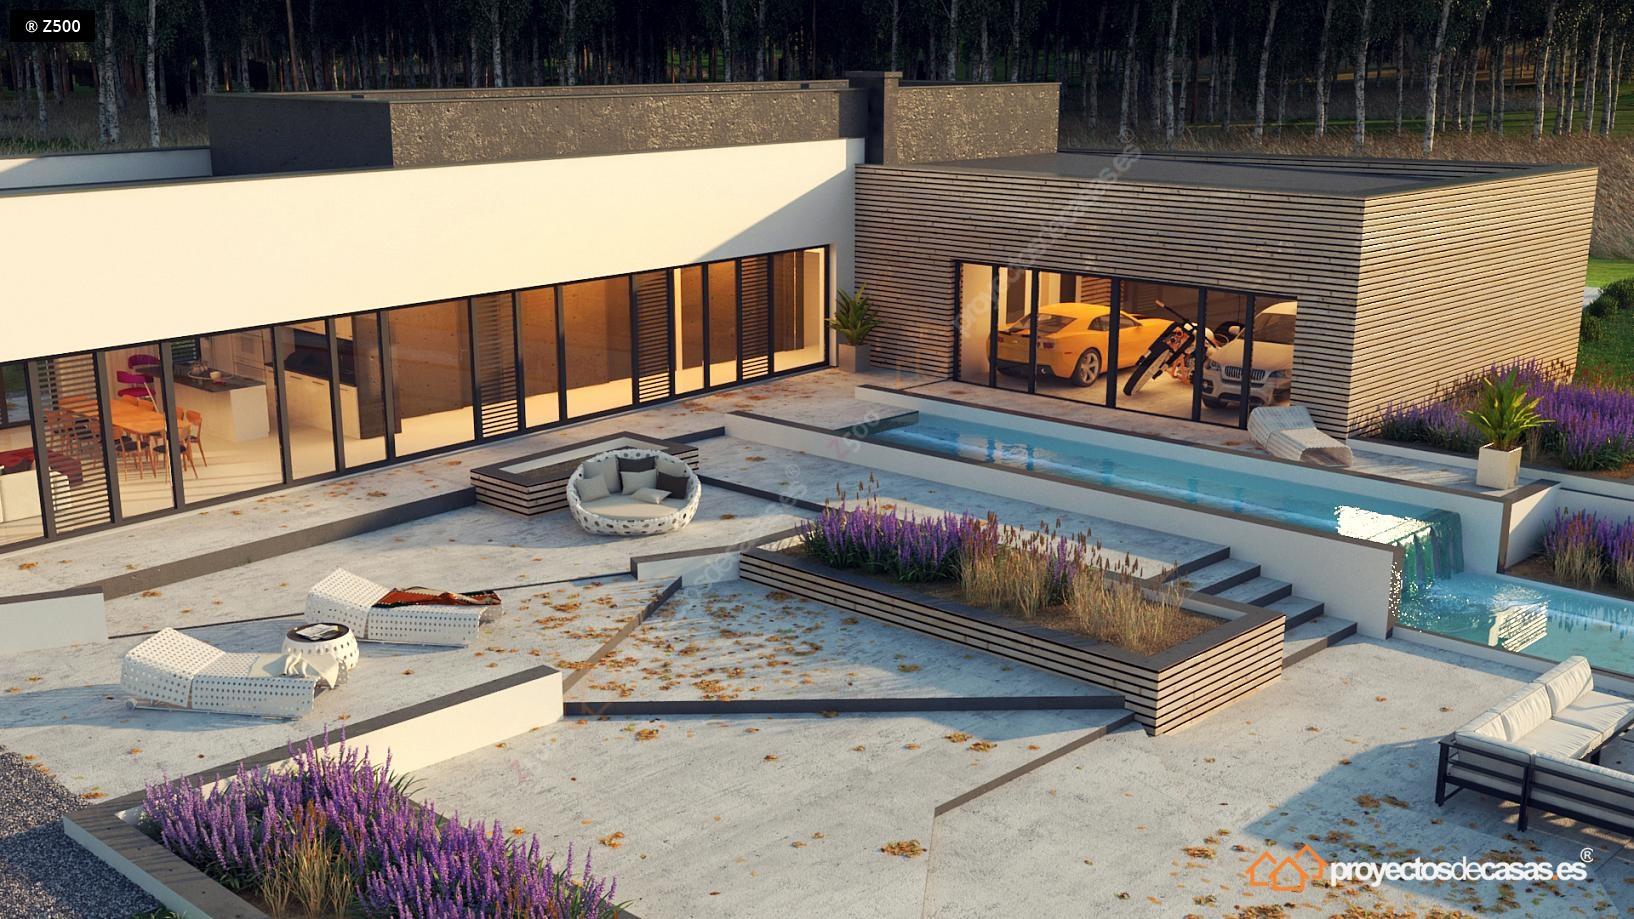 Casa moderna roca llisa con piscina y garaje a la vista for Casa moderna con piscina